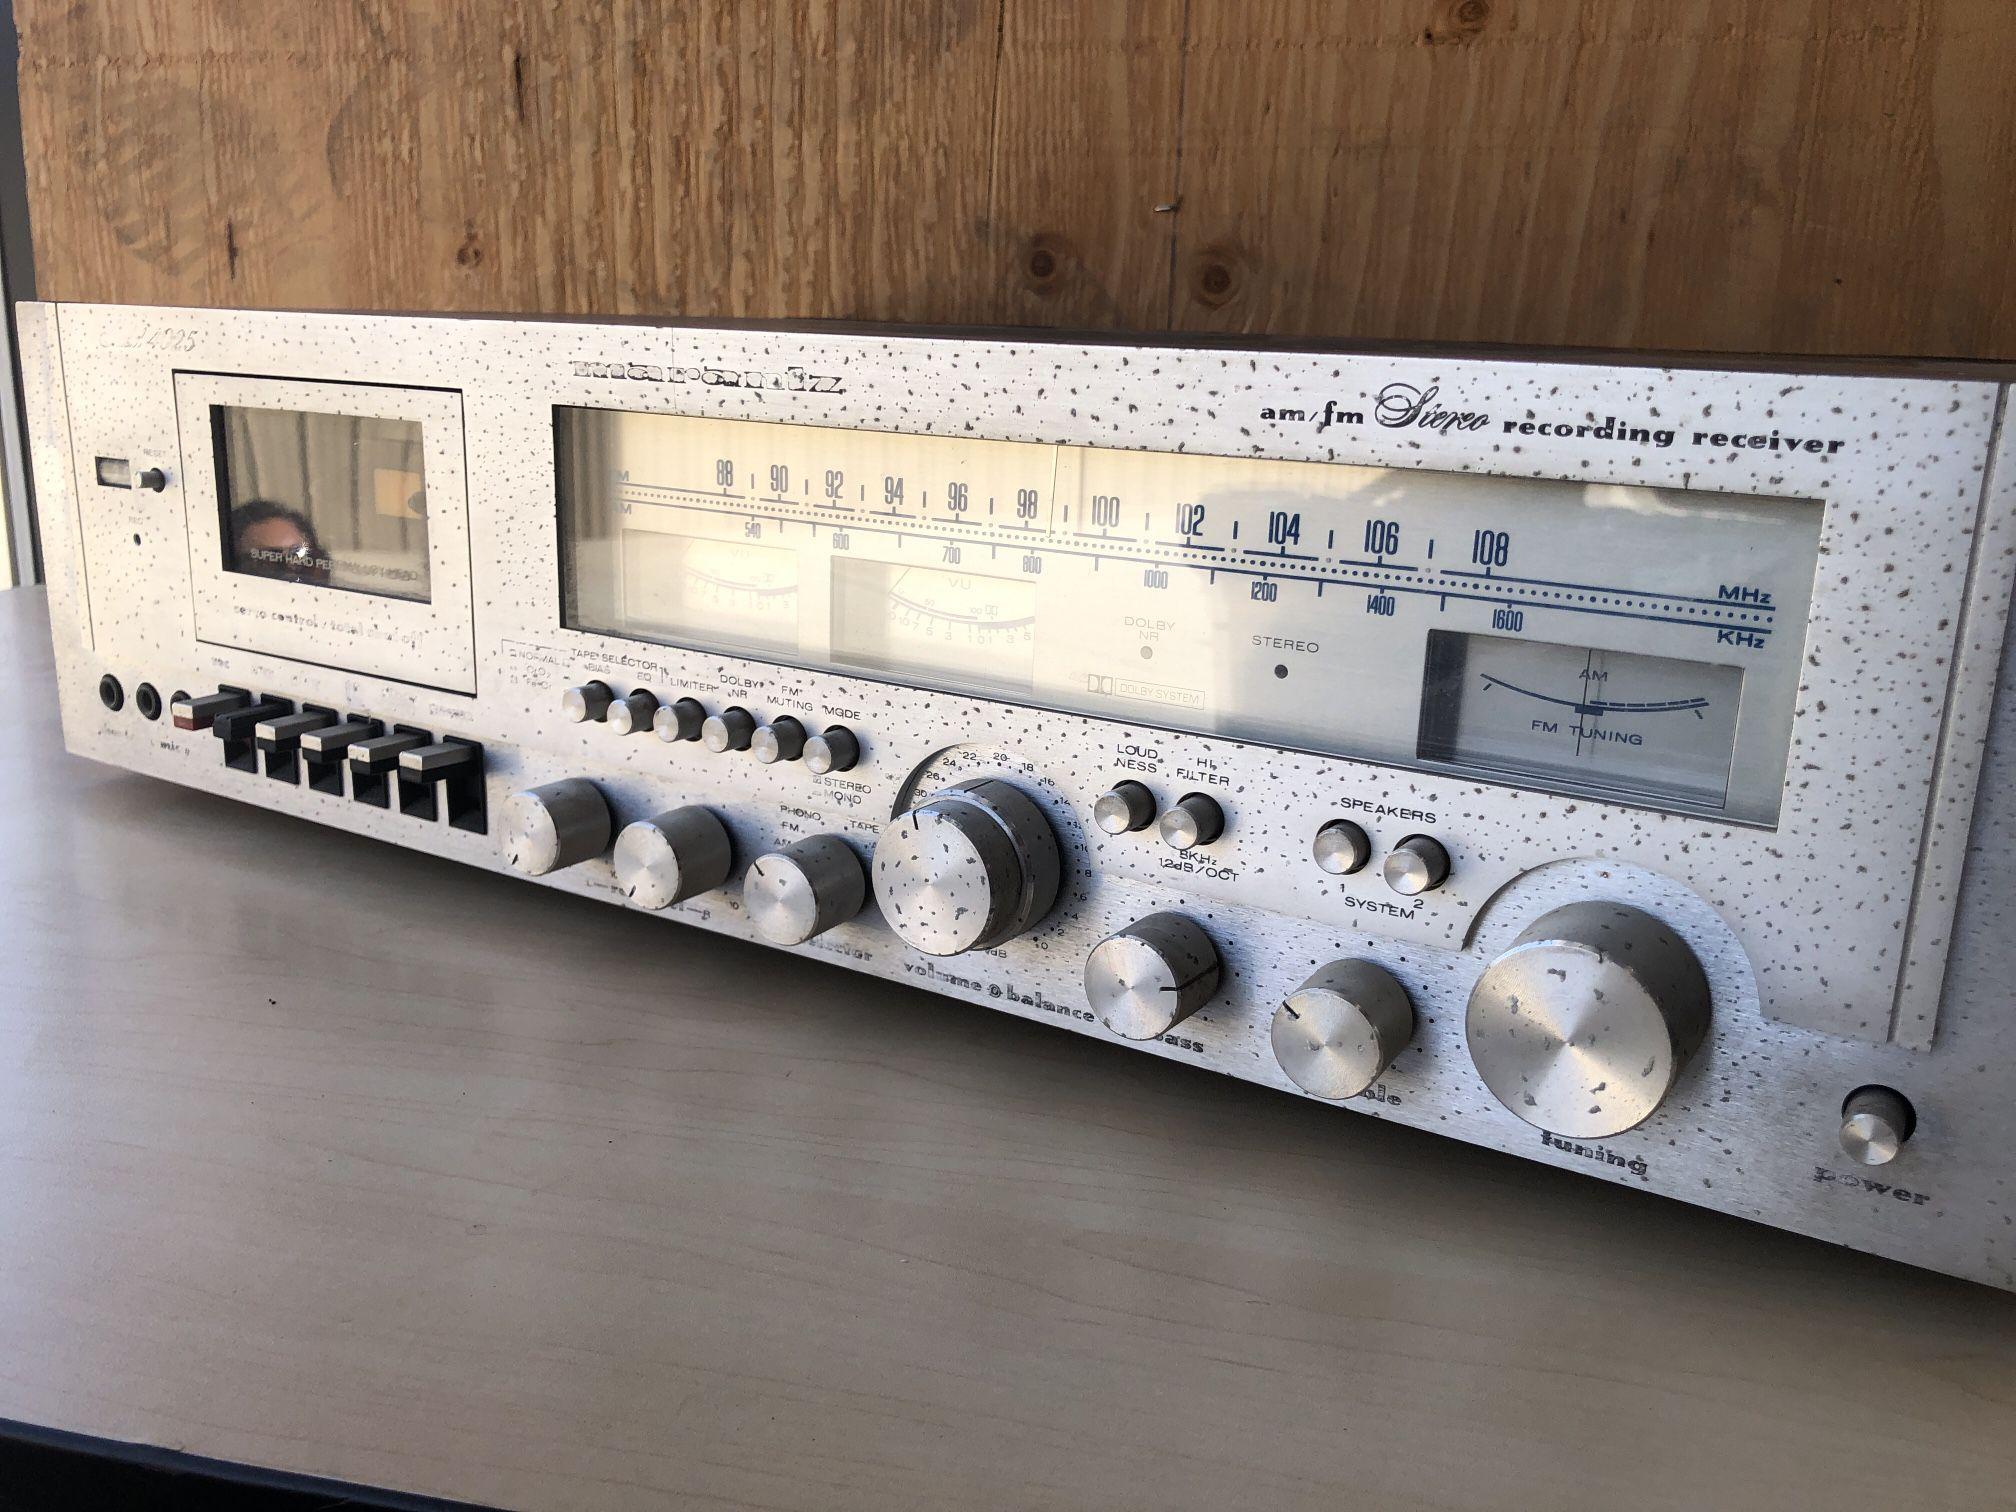 Marantz 4025 Stereo Receiver w/ Tape Deck Rare Vintage